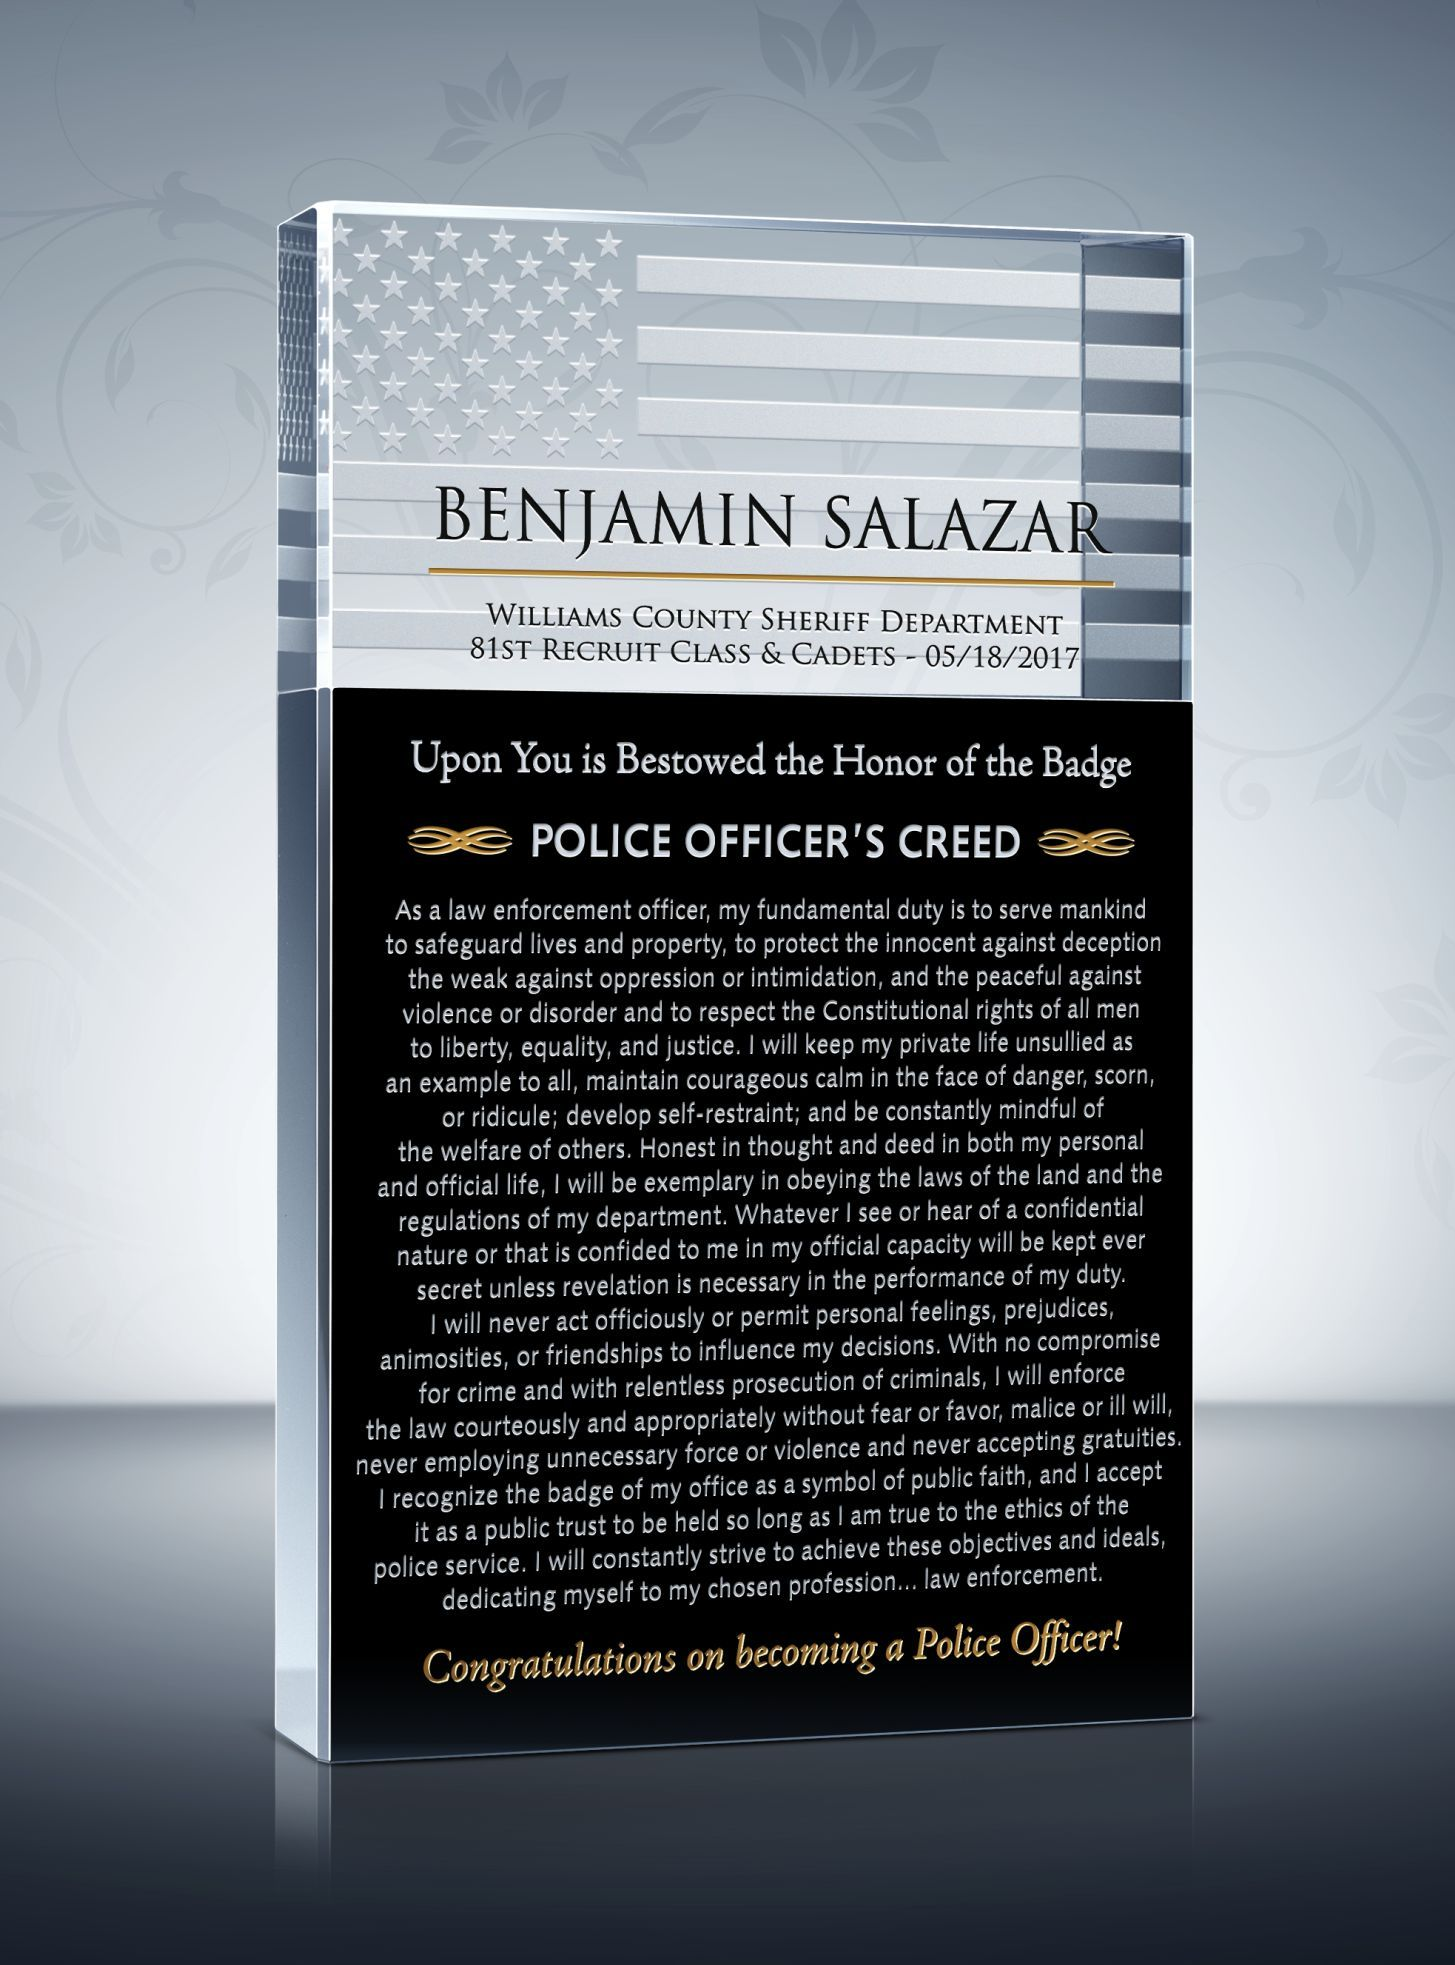 police resume template%0A Police Academy Graduation Plaque